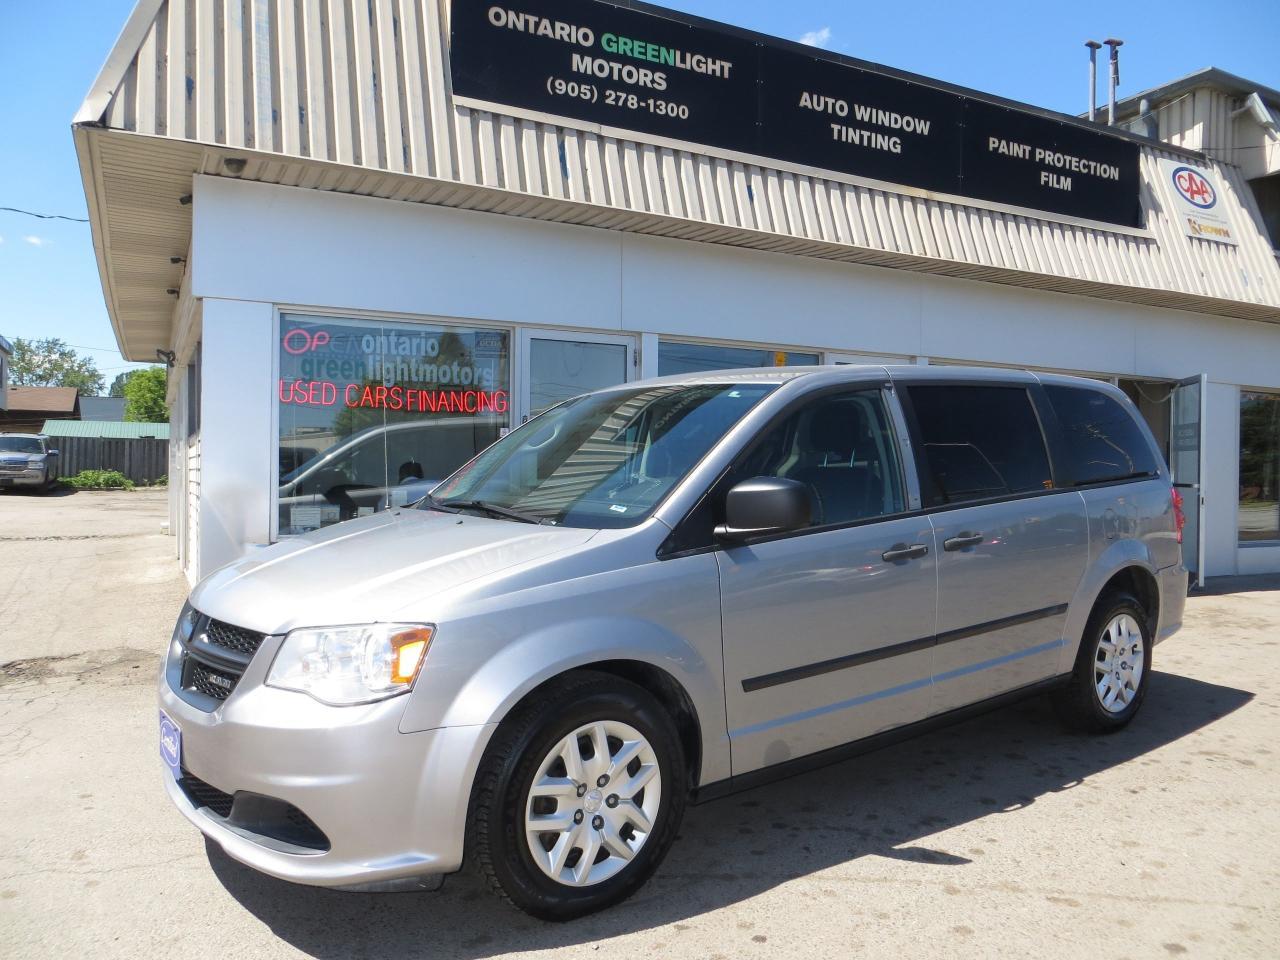 2014 Dodge Grand Caravan RAM, CARGO,heavy duty floor,BOXES,DIDVIDER,SHELVES